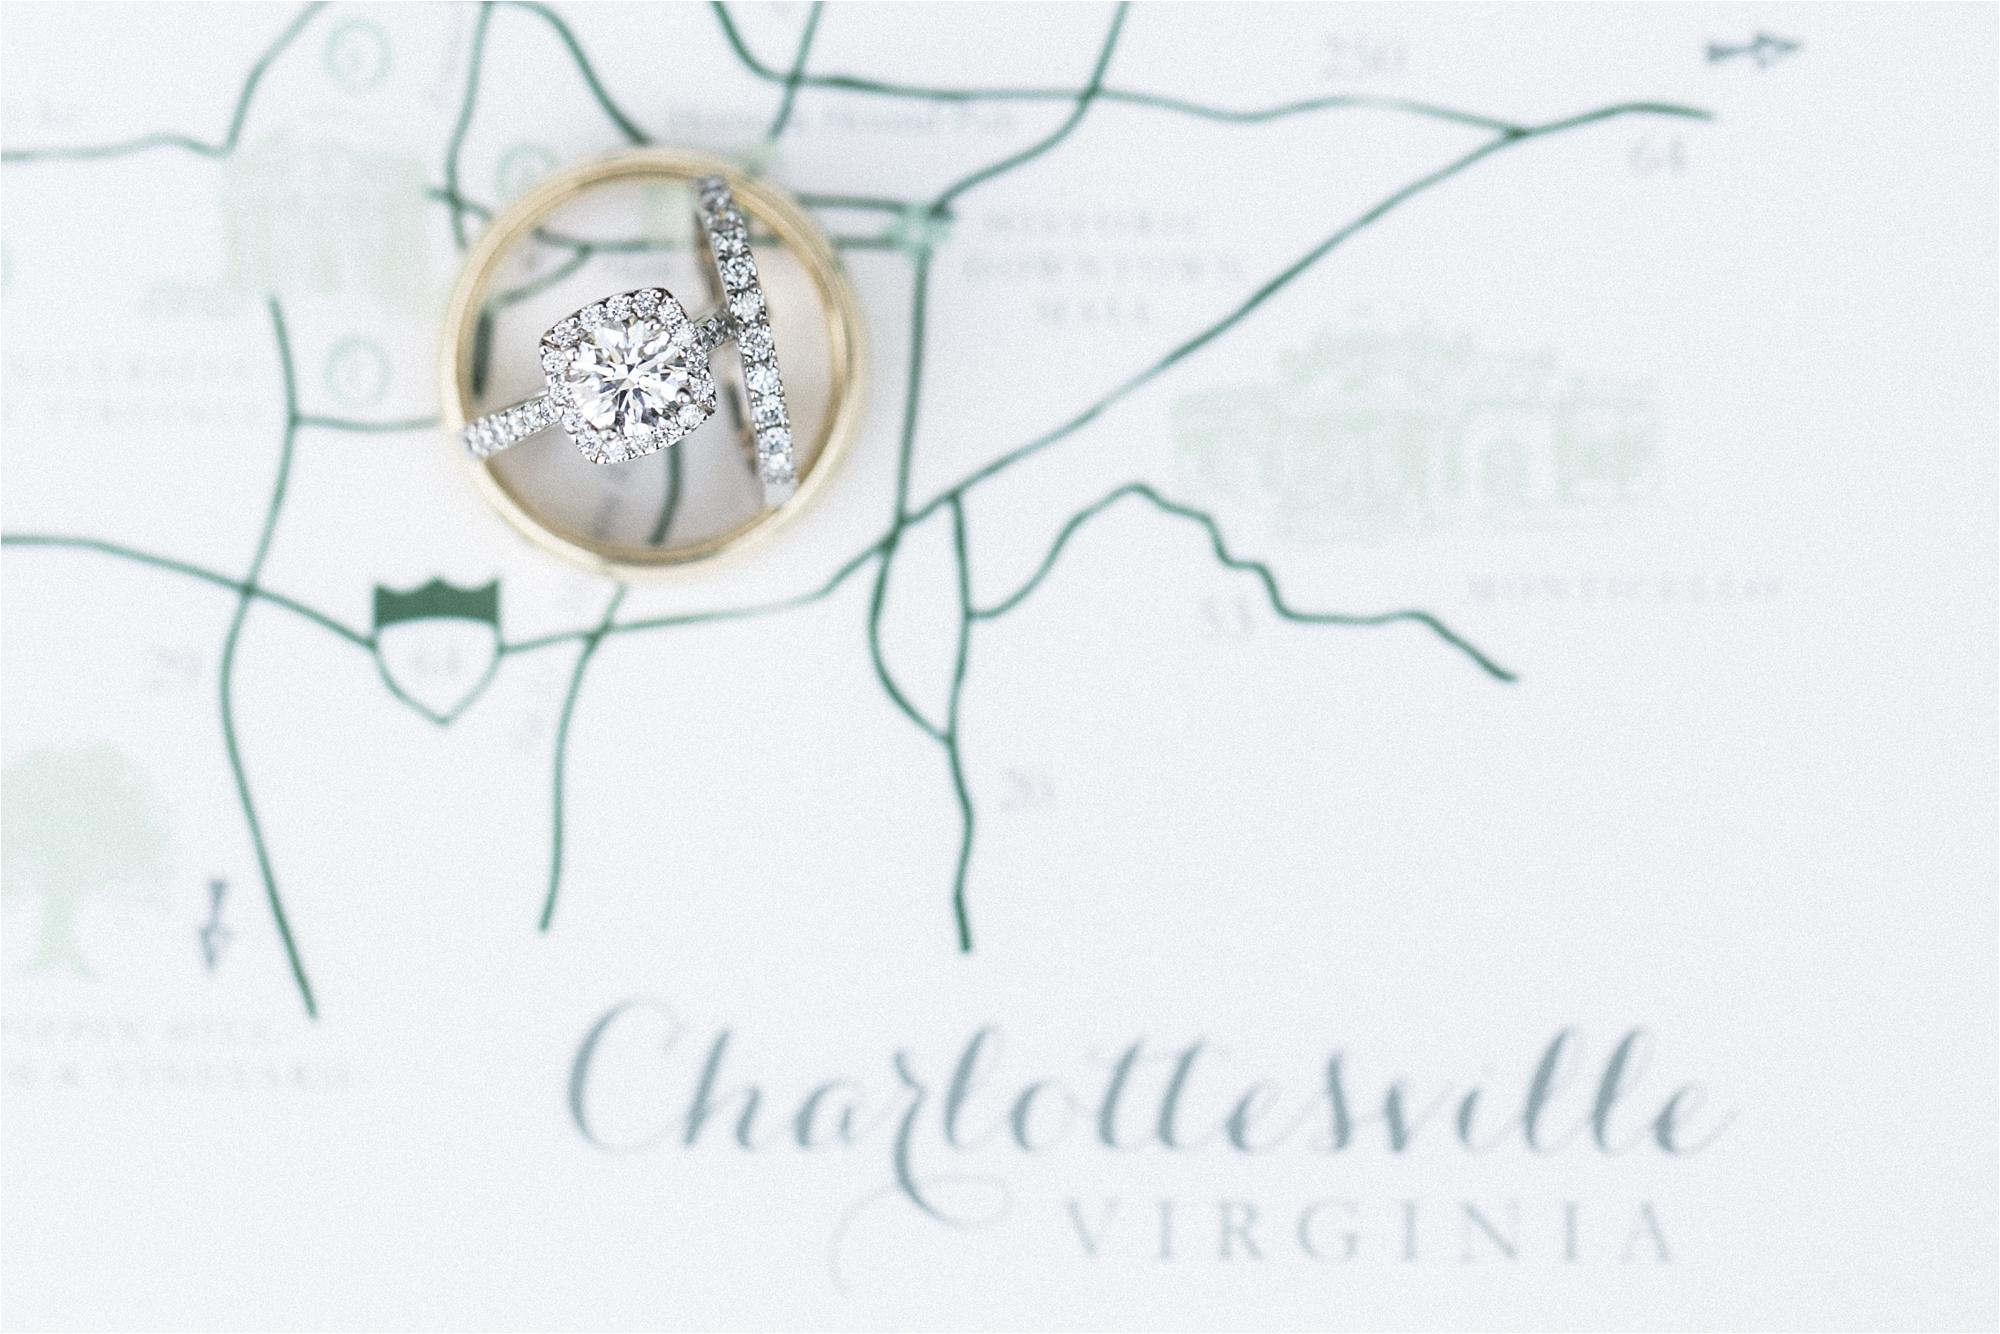 stephanie-yonce-charlottesville-virginia-king-family-vineyard-wedding-photos_0030.jpg